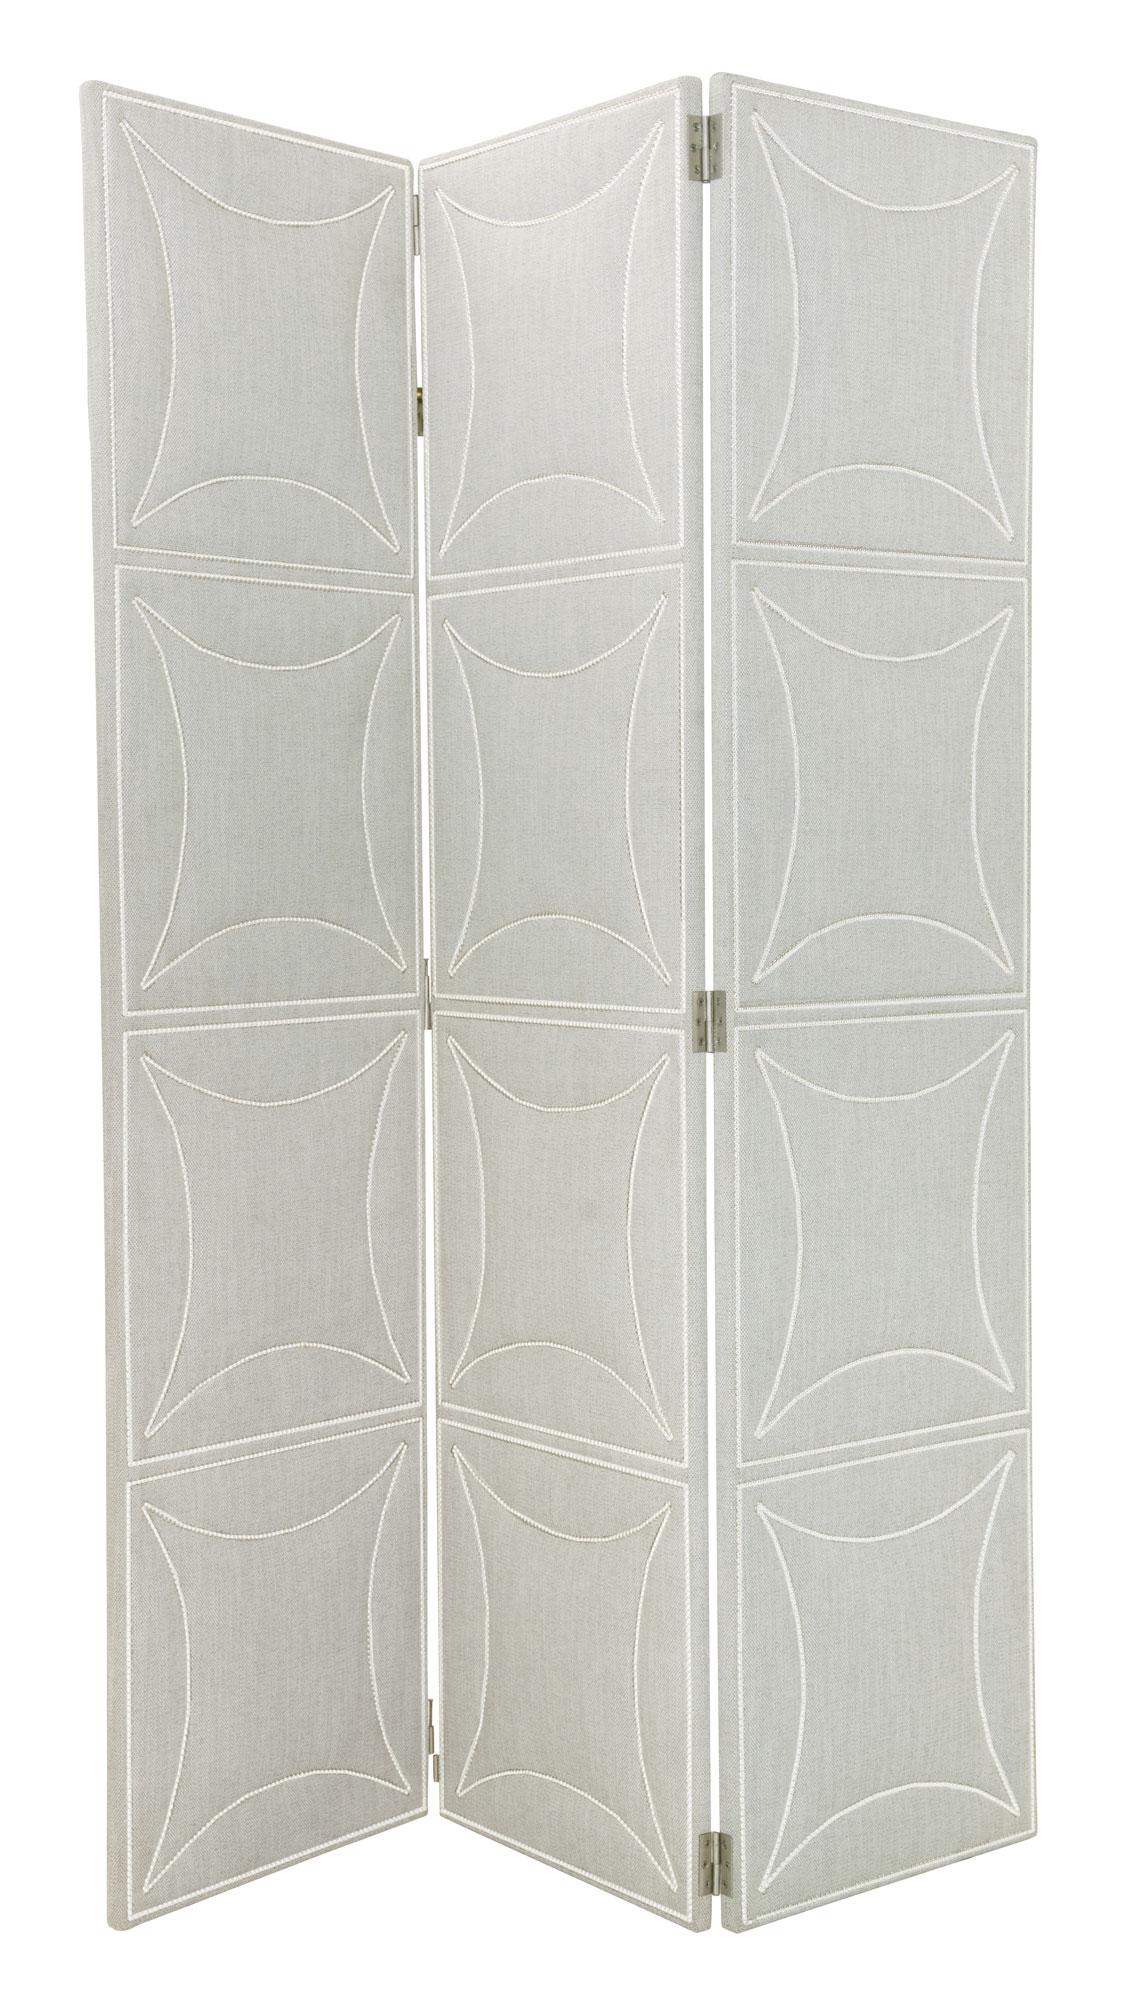 Bernhardt Criteria Upholstered Screen With Decorative